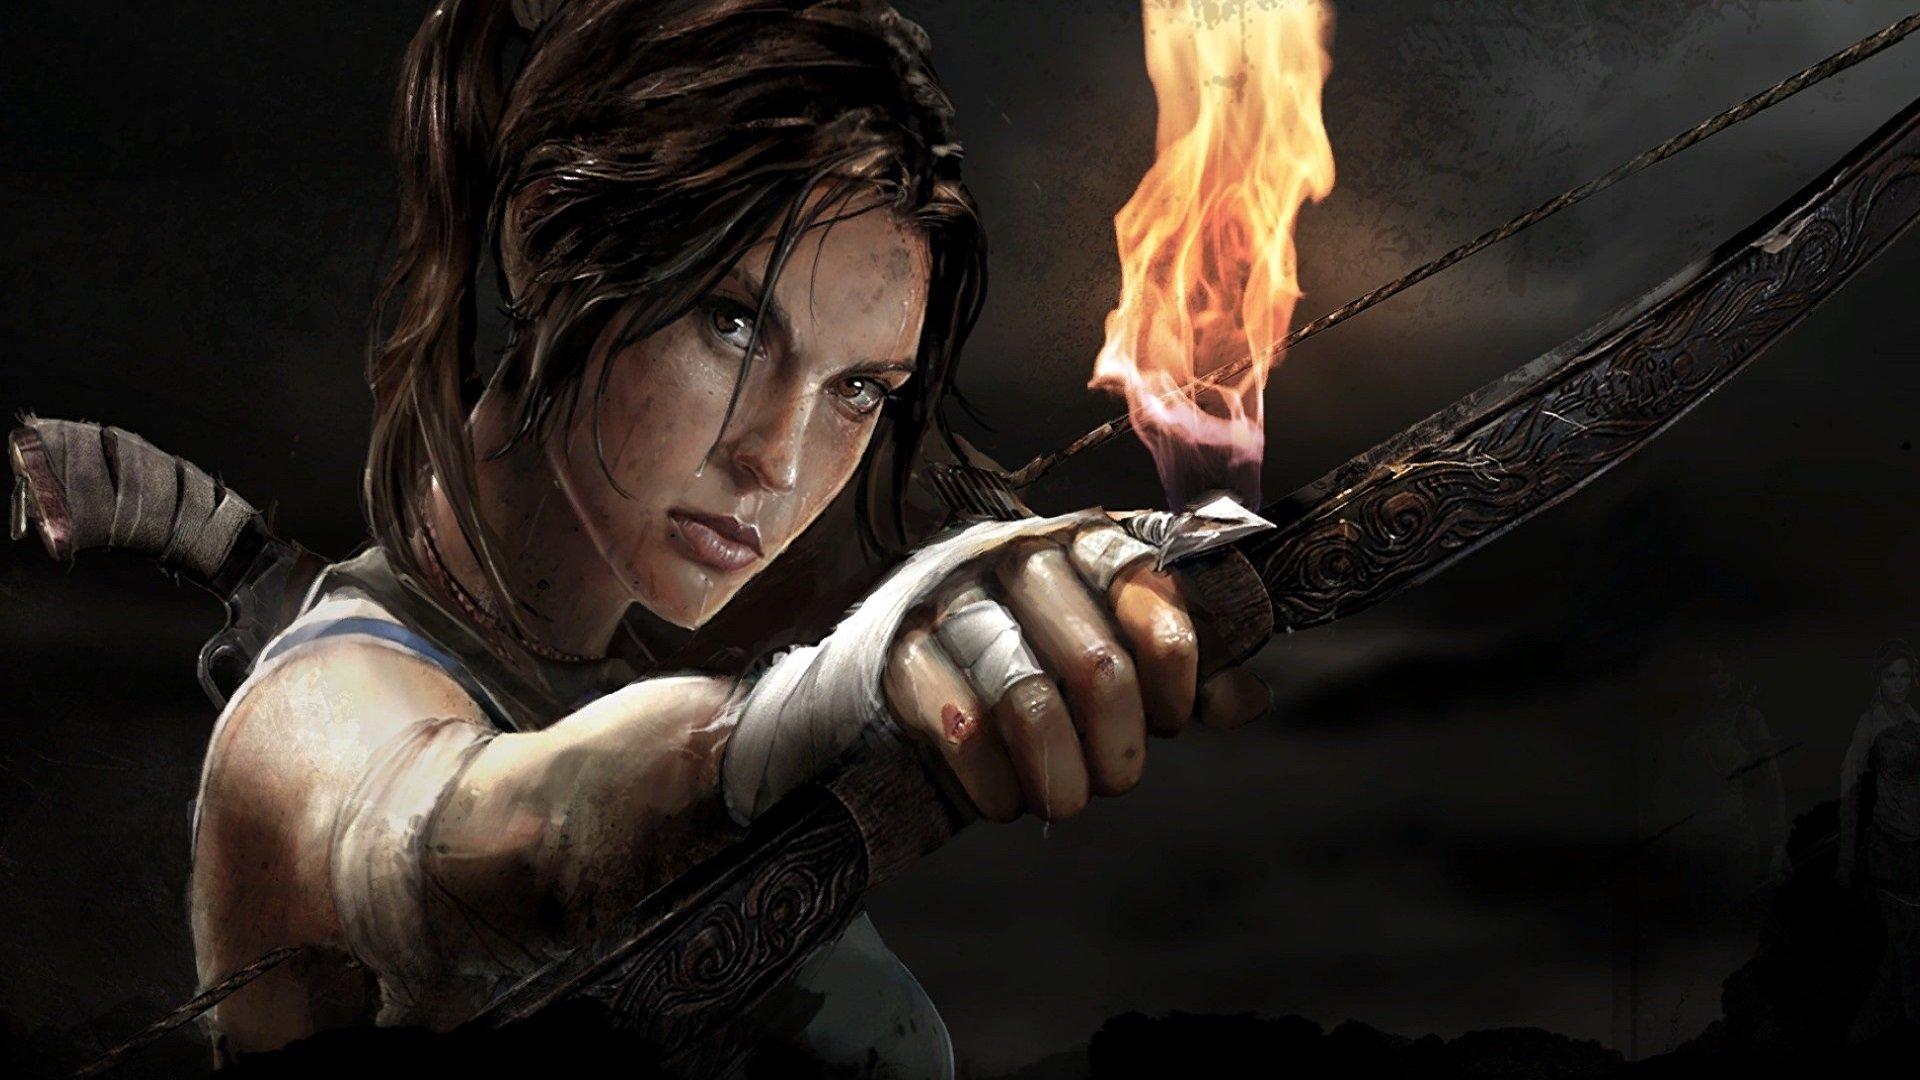 7680x4320 Lara Croft 8k Artwork 8k Hd 4k Wallpapers: Page 2 Of Lara Wallpapers, Photos And Desktop Backgrounds